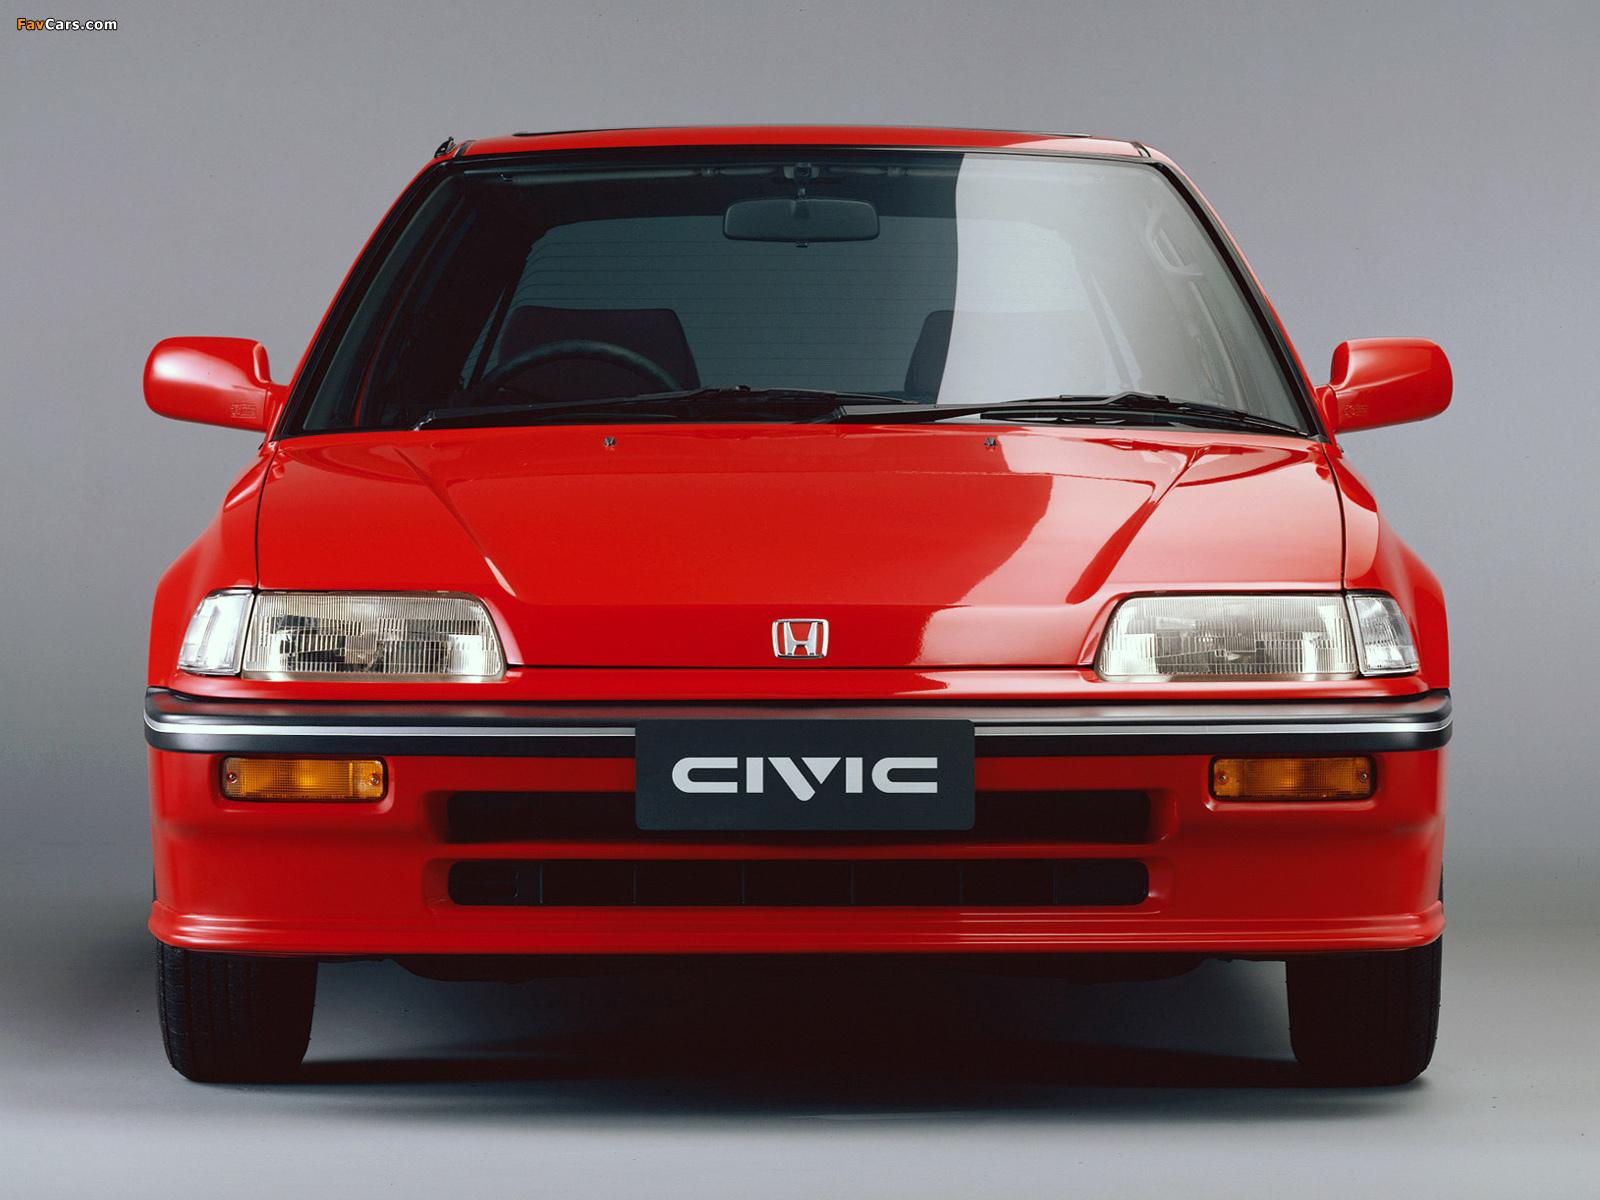 Honda civic hatchback ef 1988 91 wallpapers 1600x1200 for Honda civic 1988